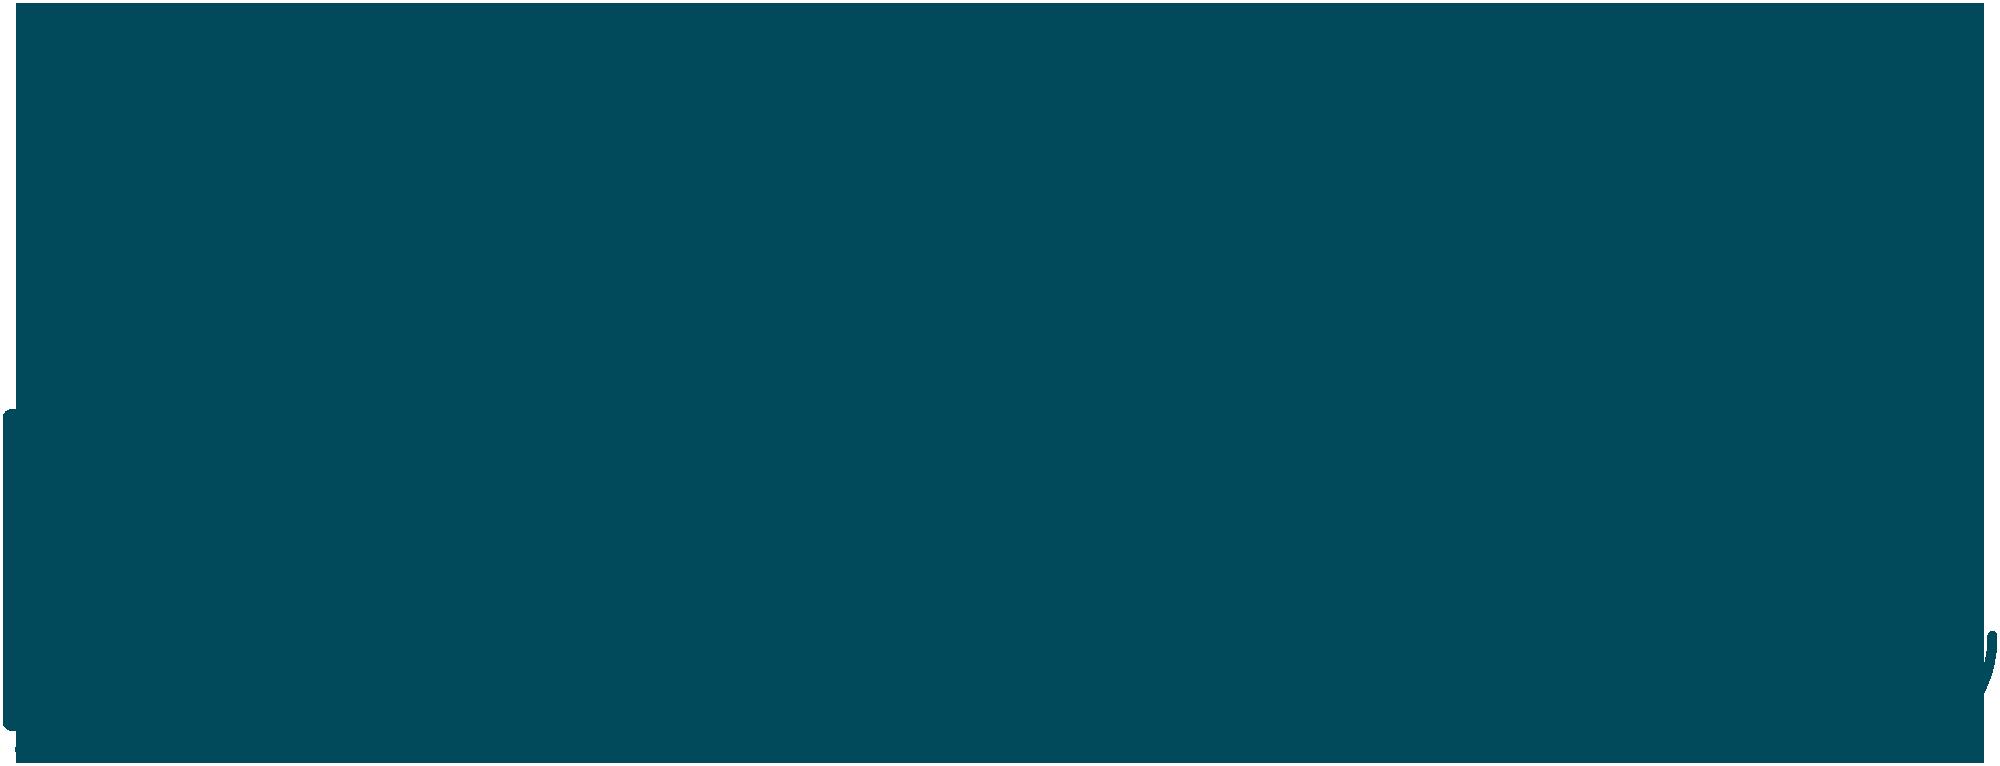 furry-friends_logotype_dark-turquoise_rgb